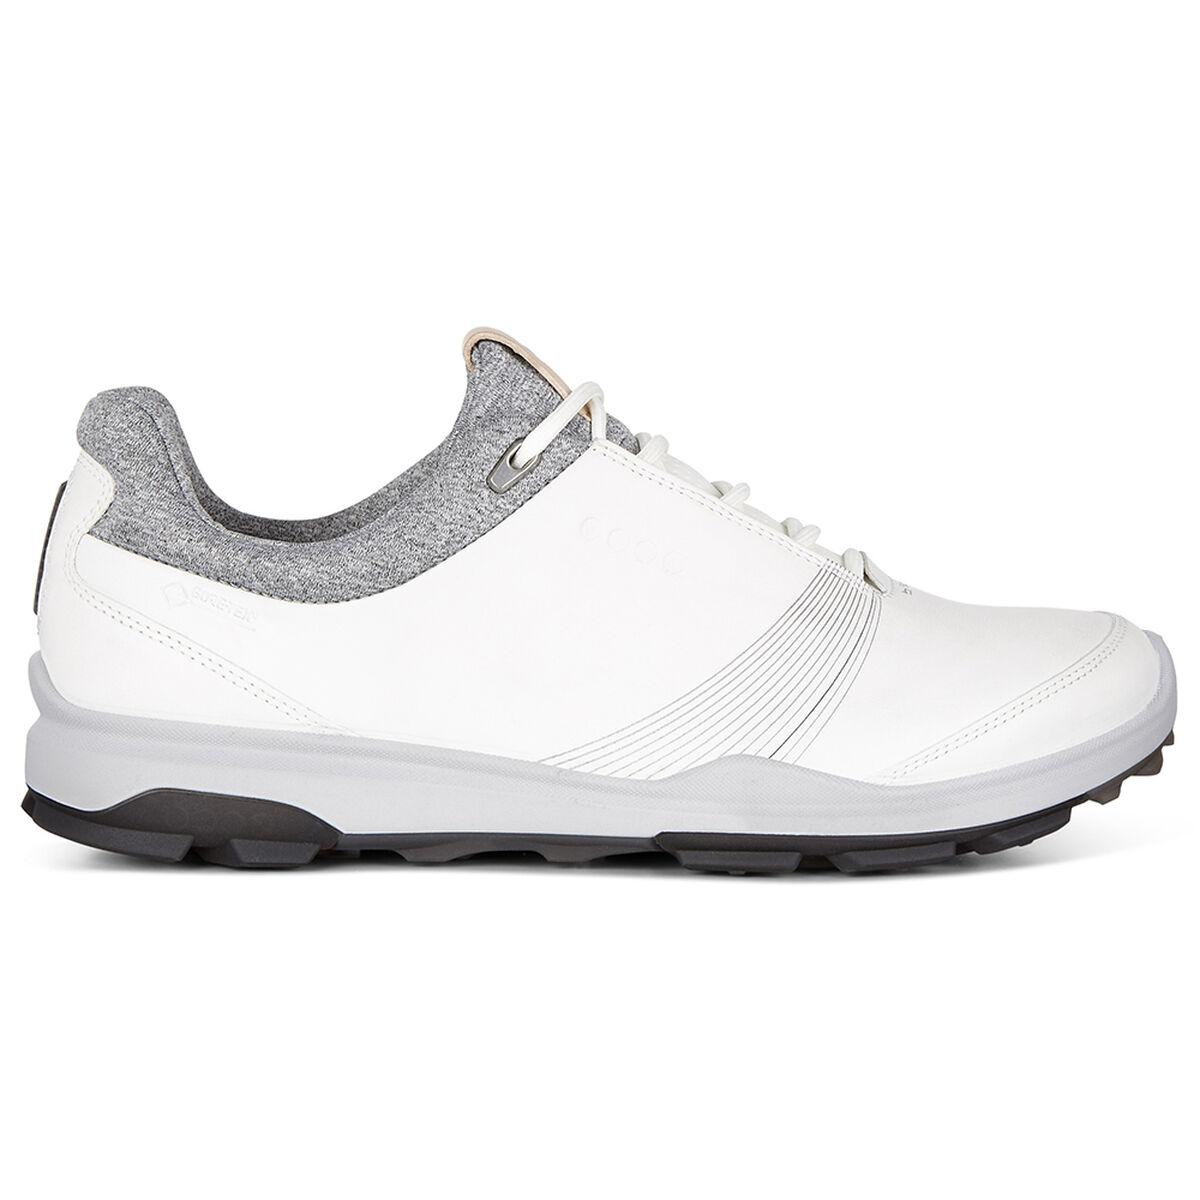 bc4629576e ECCO BIOM Hybrid 3 GTX Women's Golf Shoe - White/Black | PGA TOUR ...